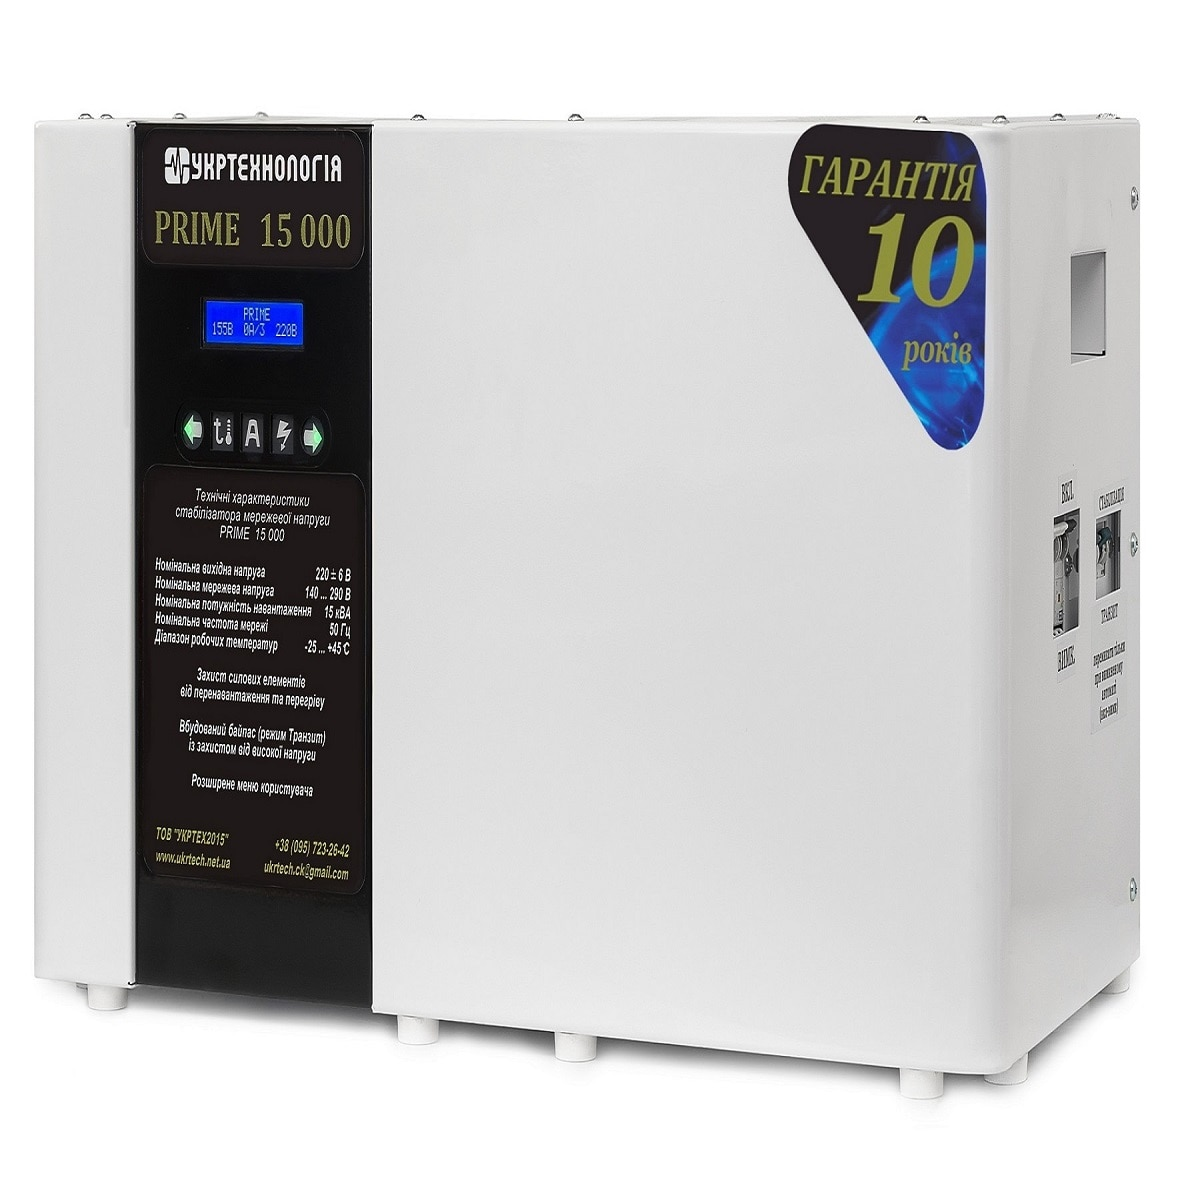 Стабилизаторы напряжения - Стабилизатор напряжения 15 кВт РRIME 000001458 - Фото 1